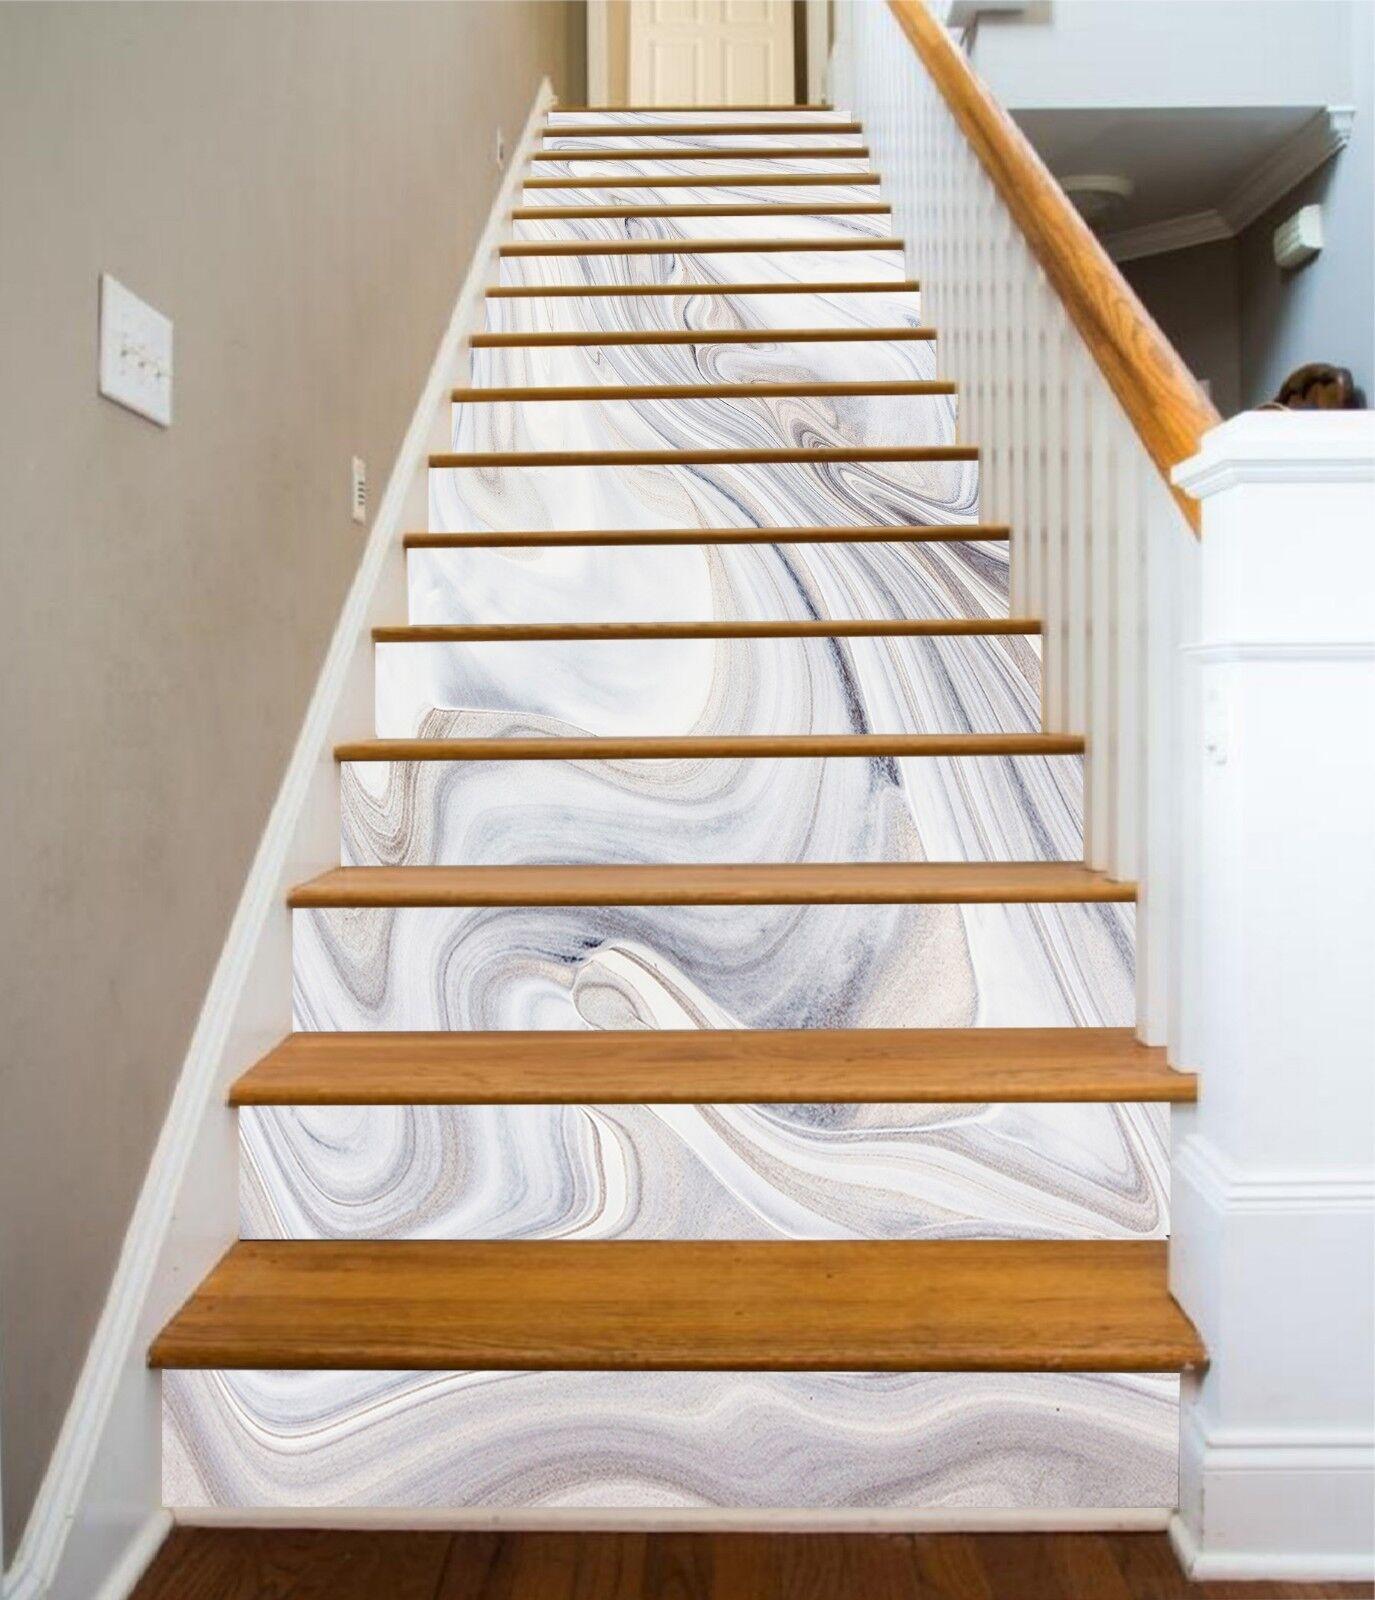 3D Wei Schattie 83 Fliese Marmor Stair Risers Fototapete Vinyl Aufkleber Tapete